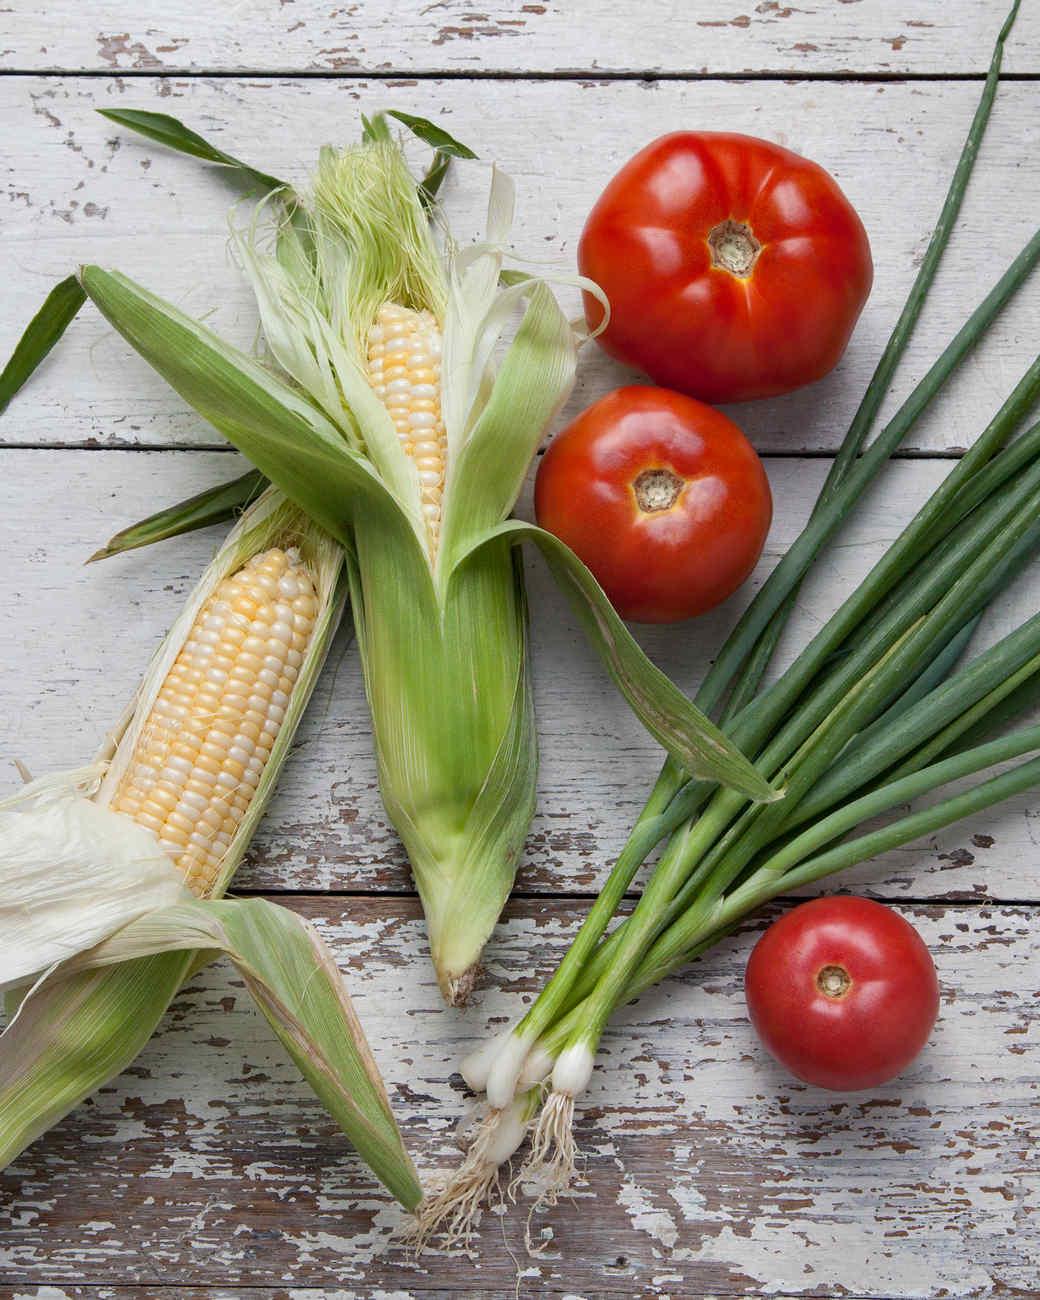 tomatoes-corn-scallions-pantry-0029-d112400.jpg